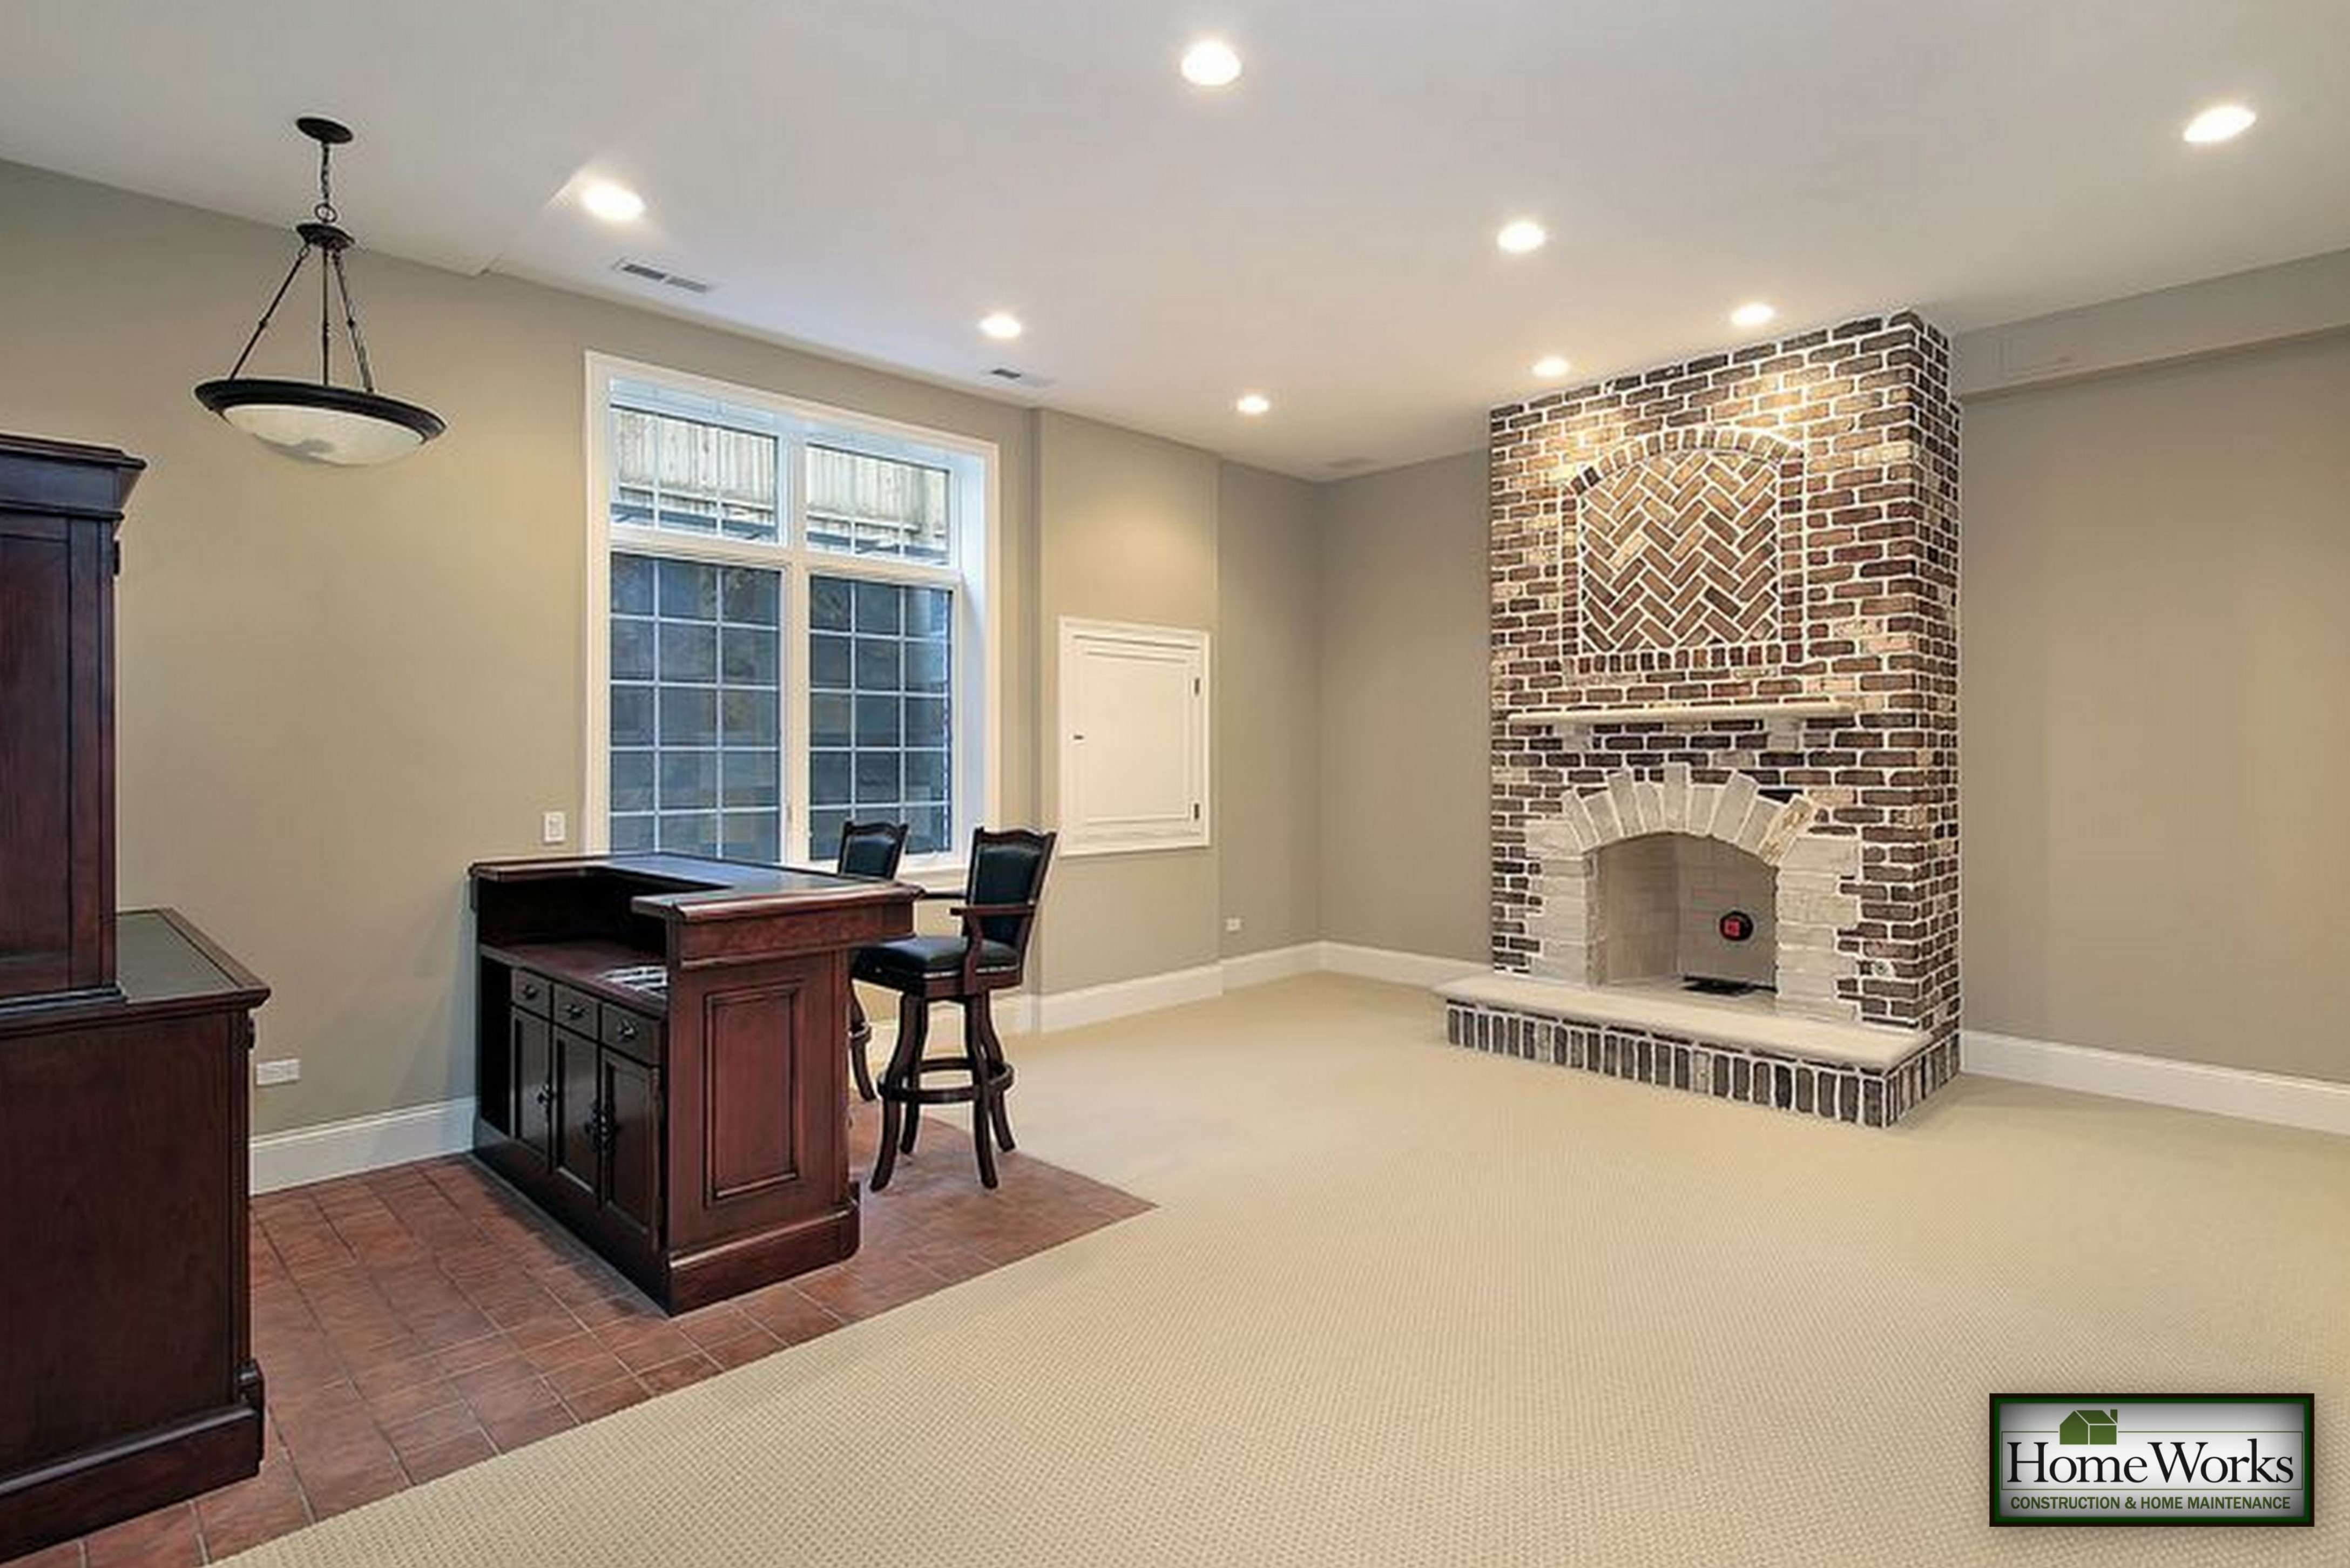 Basement Remodeling Done Right Choose Homeworks Construction